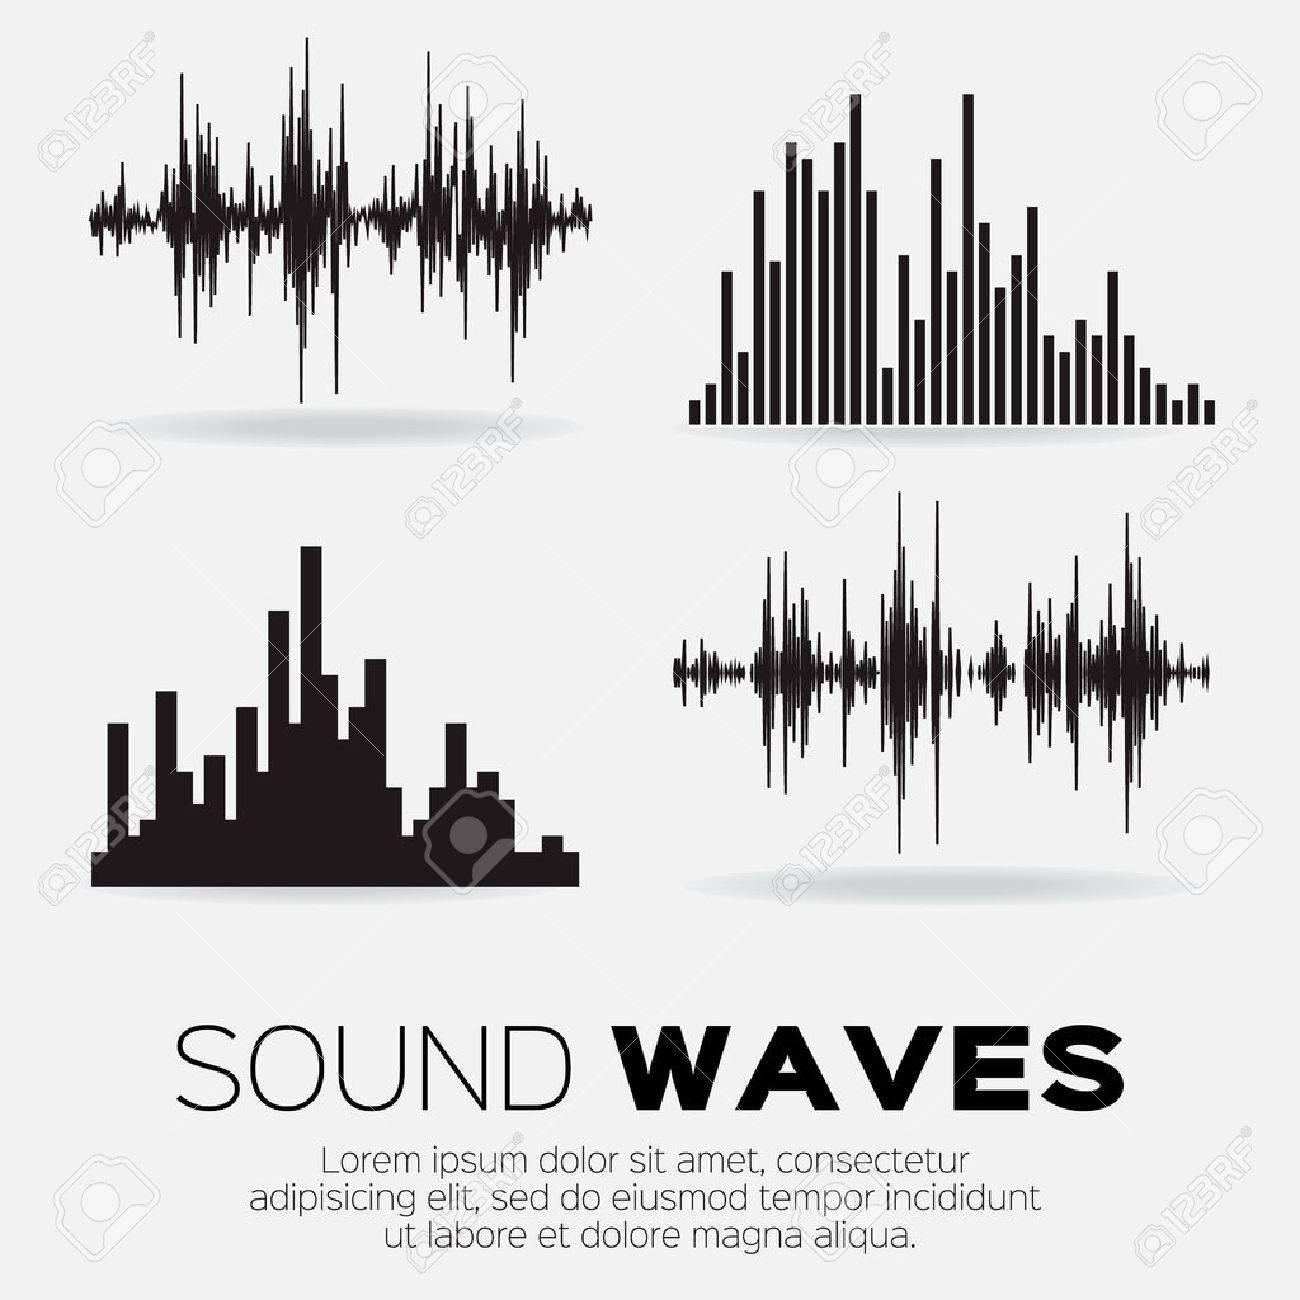 Set of 4 music sound waves. Audio sound equalizer technology, pulse musical. Vector illustration - 51443607